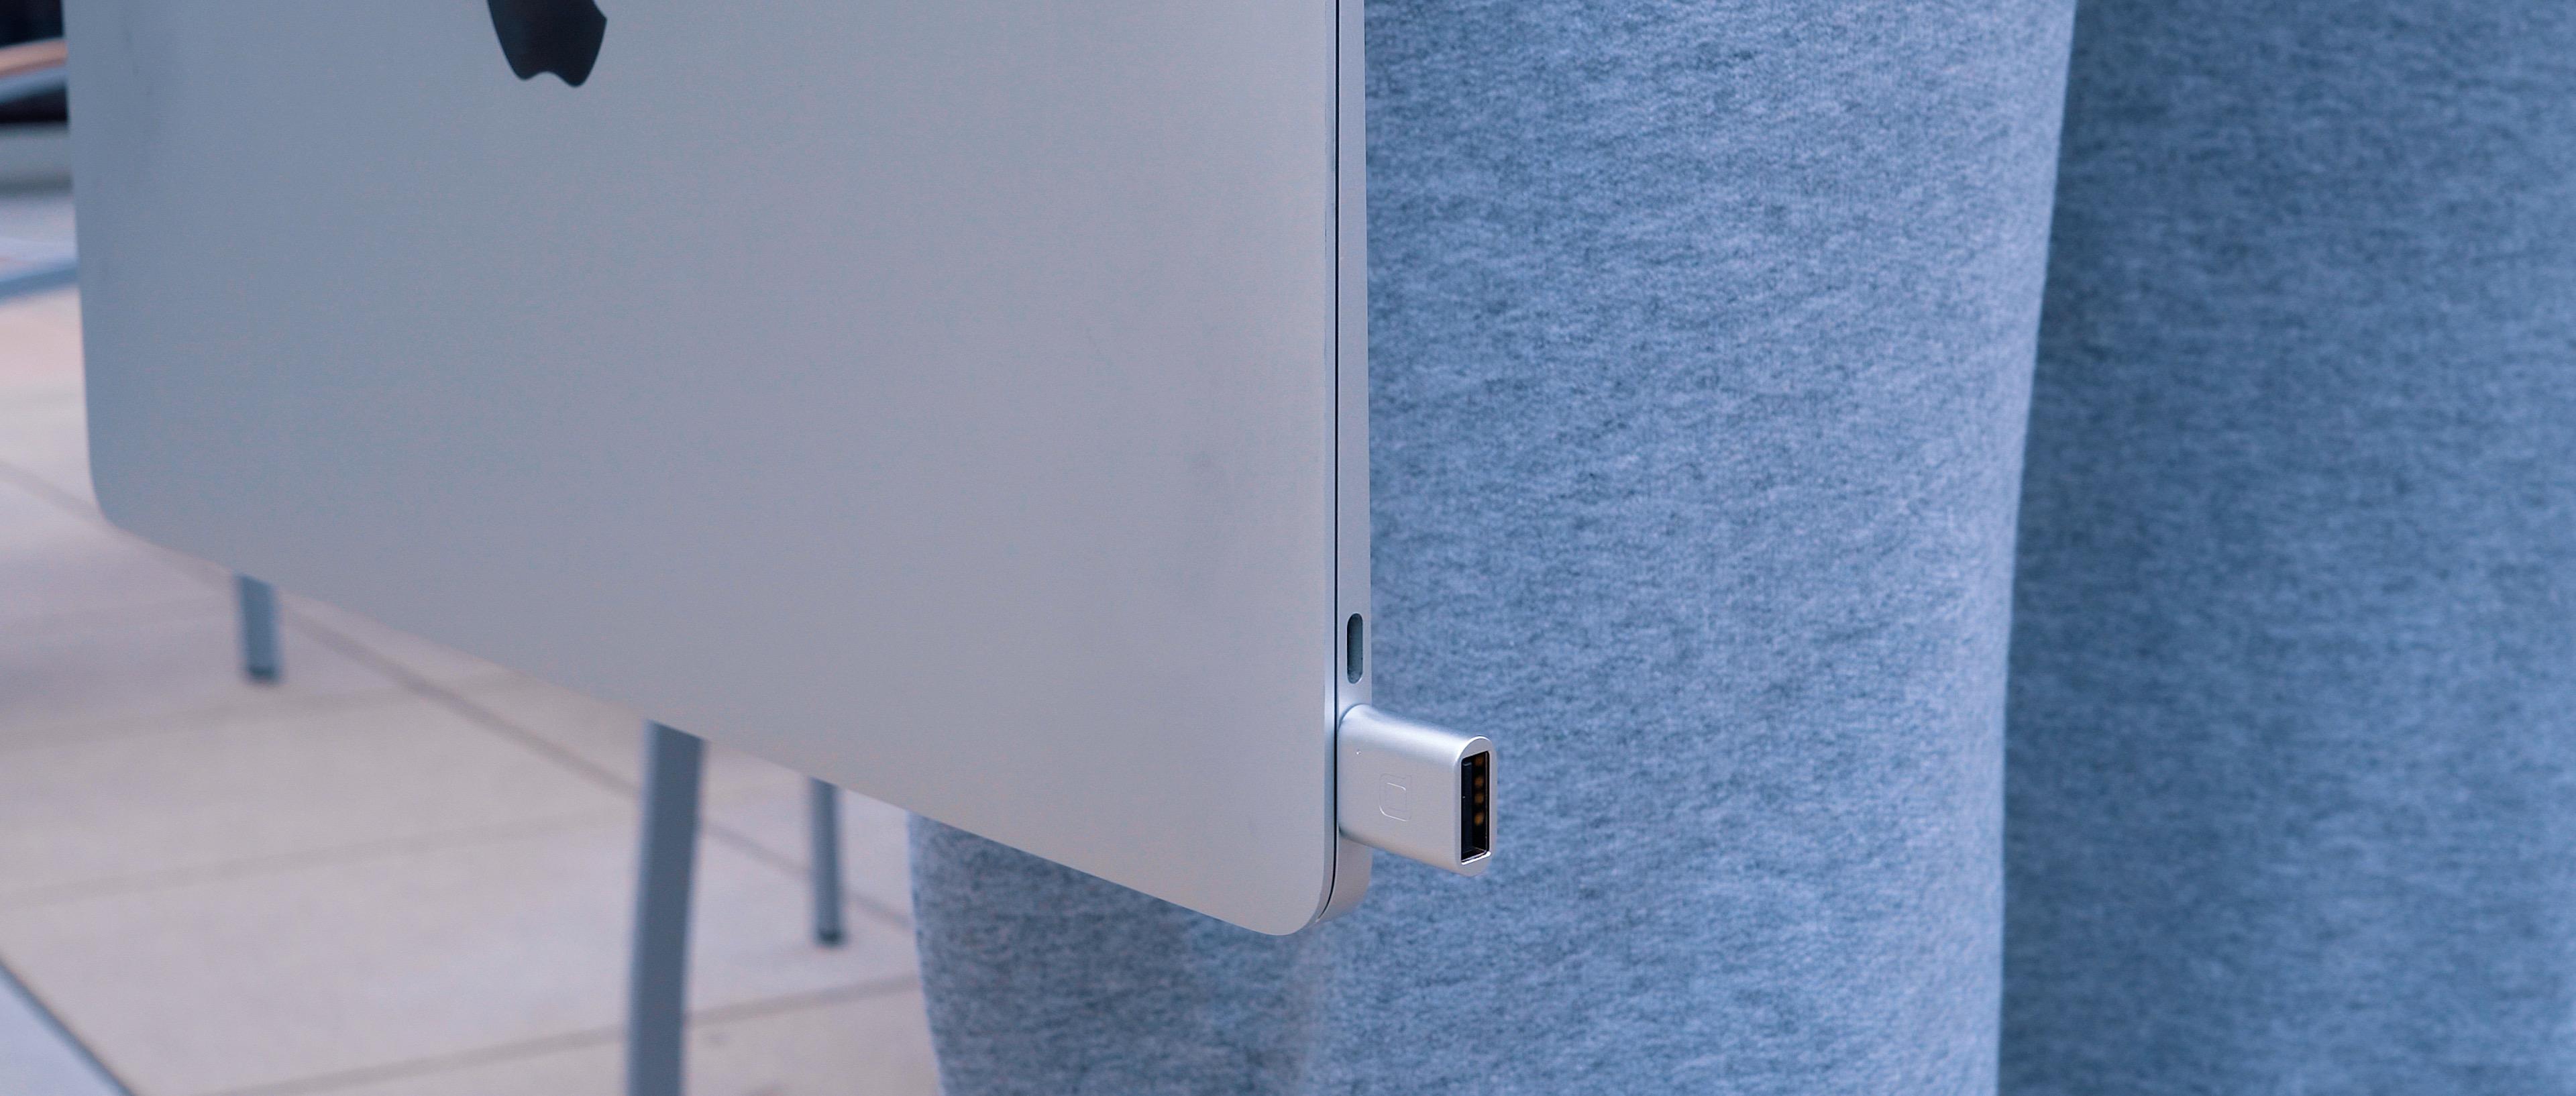 Nonda USB-C to USB-A adapter